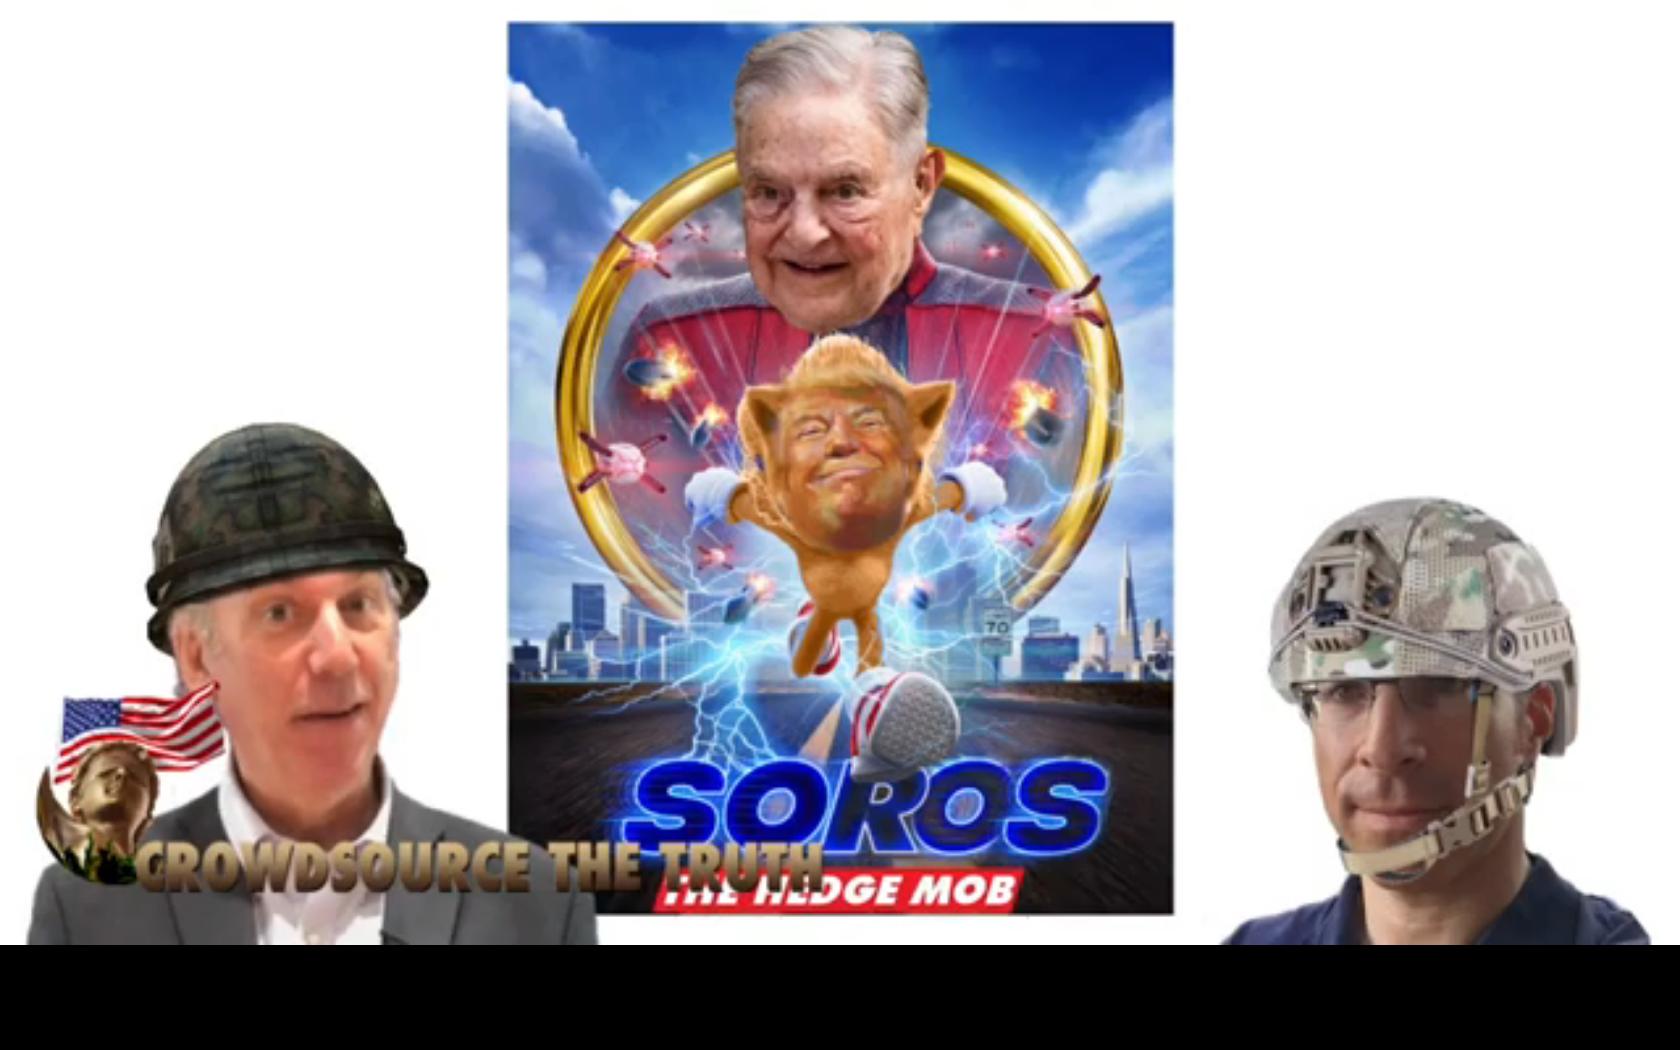 SOROS SONIC COVER Screenshot at 2020-06-07 15:27:39.png